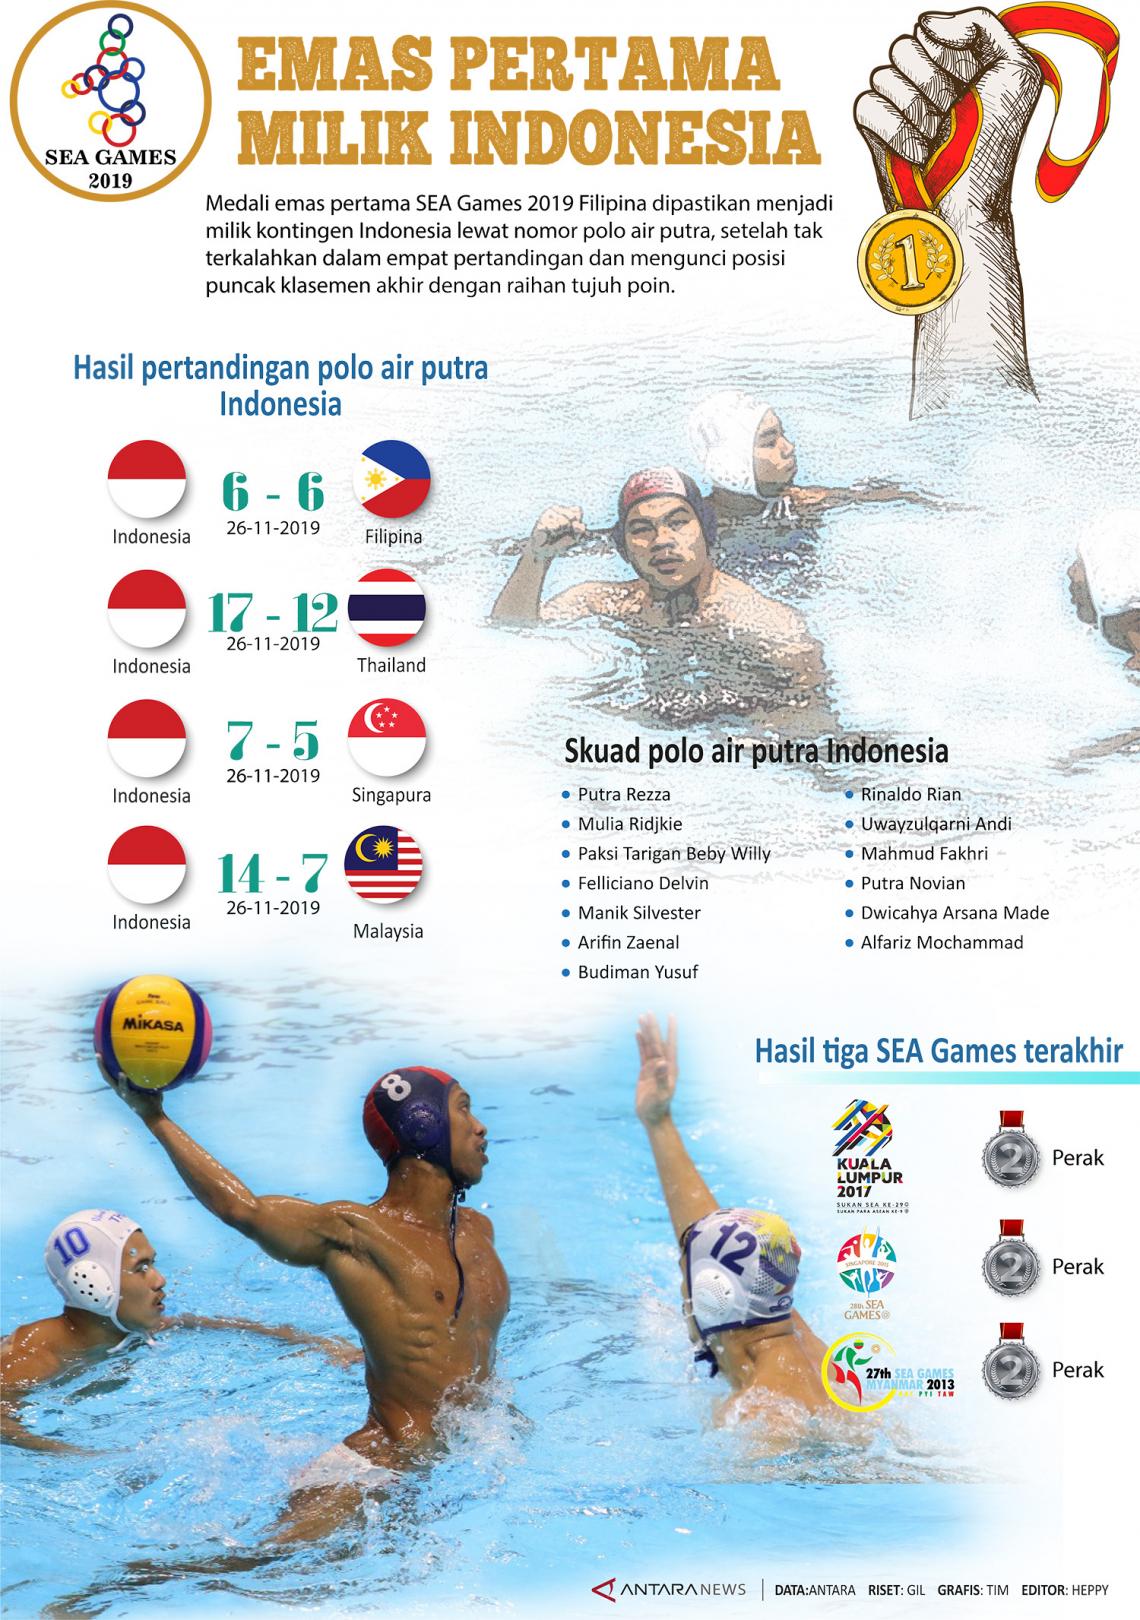 Emas pertama SEA Games 2019 milik Indonesia